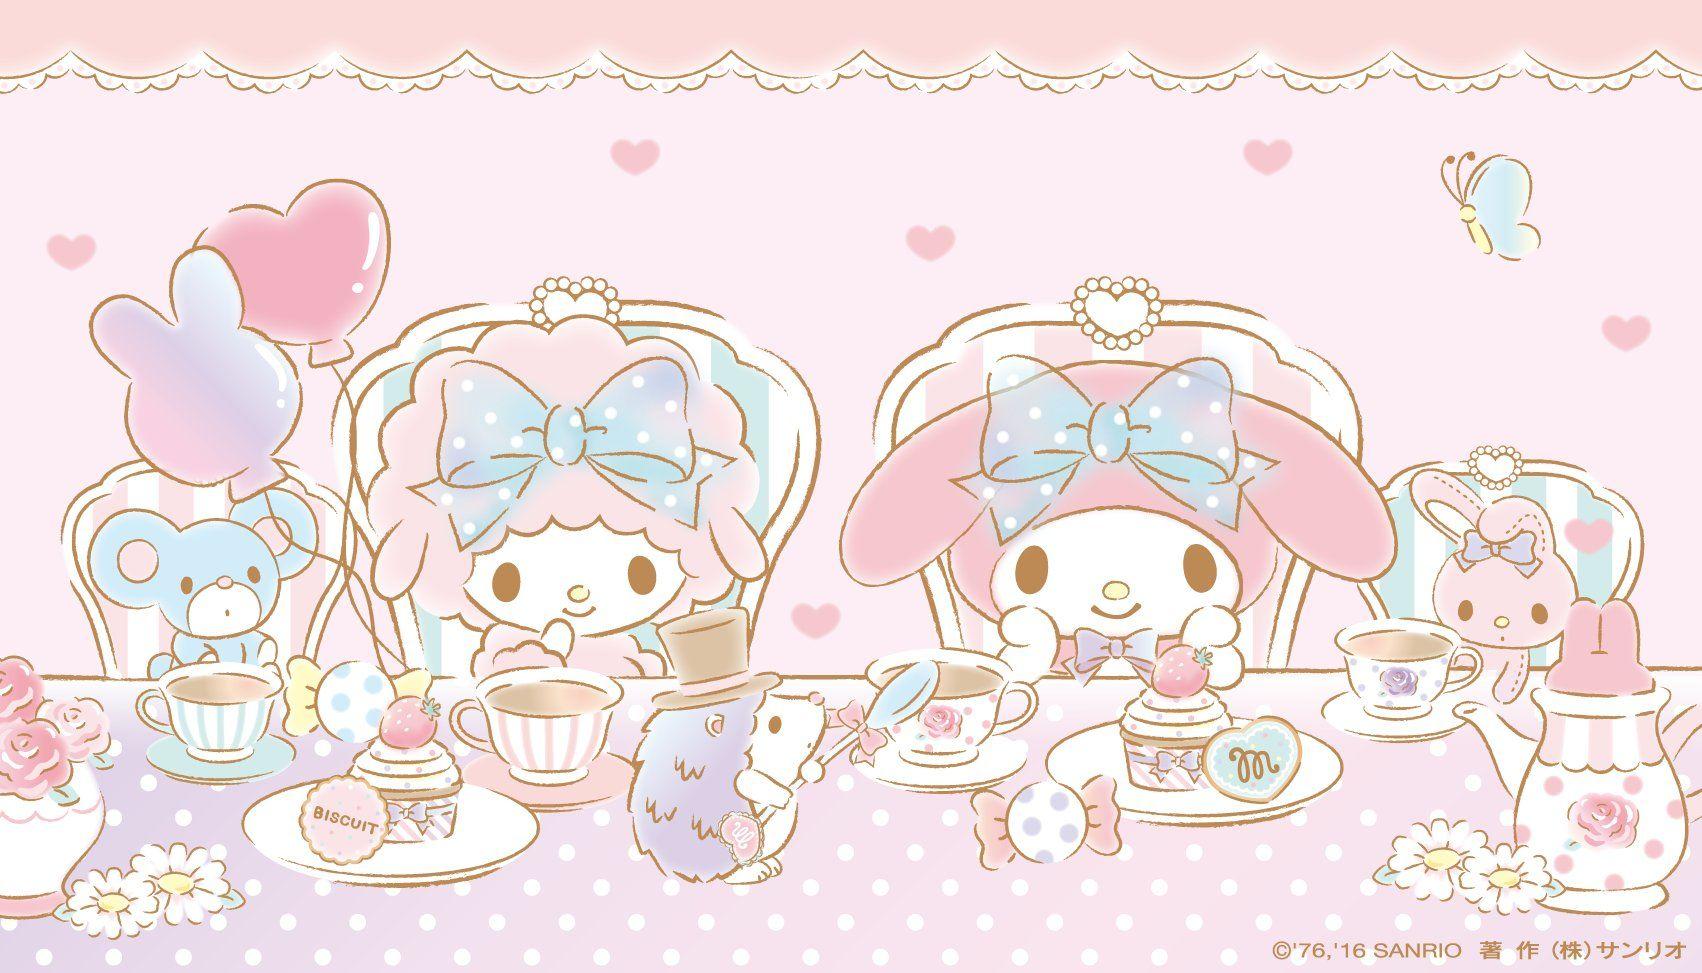 My Melody & My Sweet Piano | マイメロ 壁紙, 病みかわいい, サンリオ 壁紙